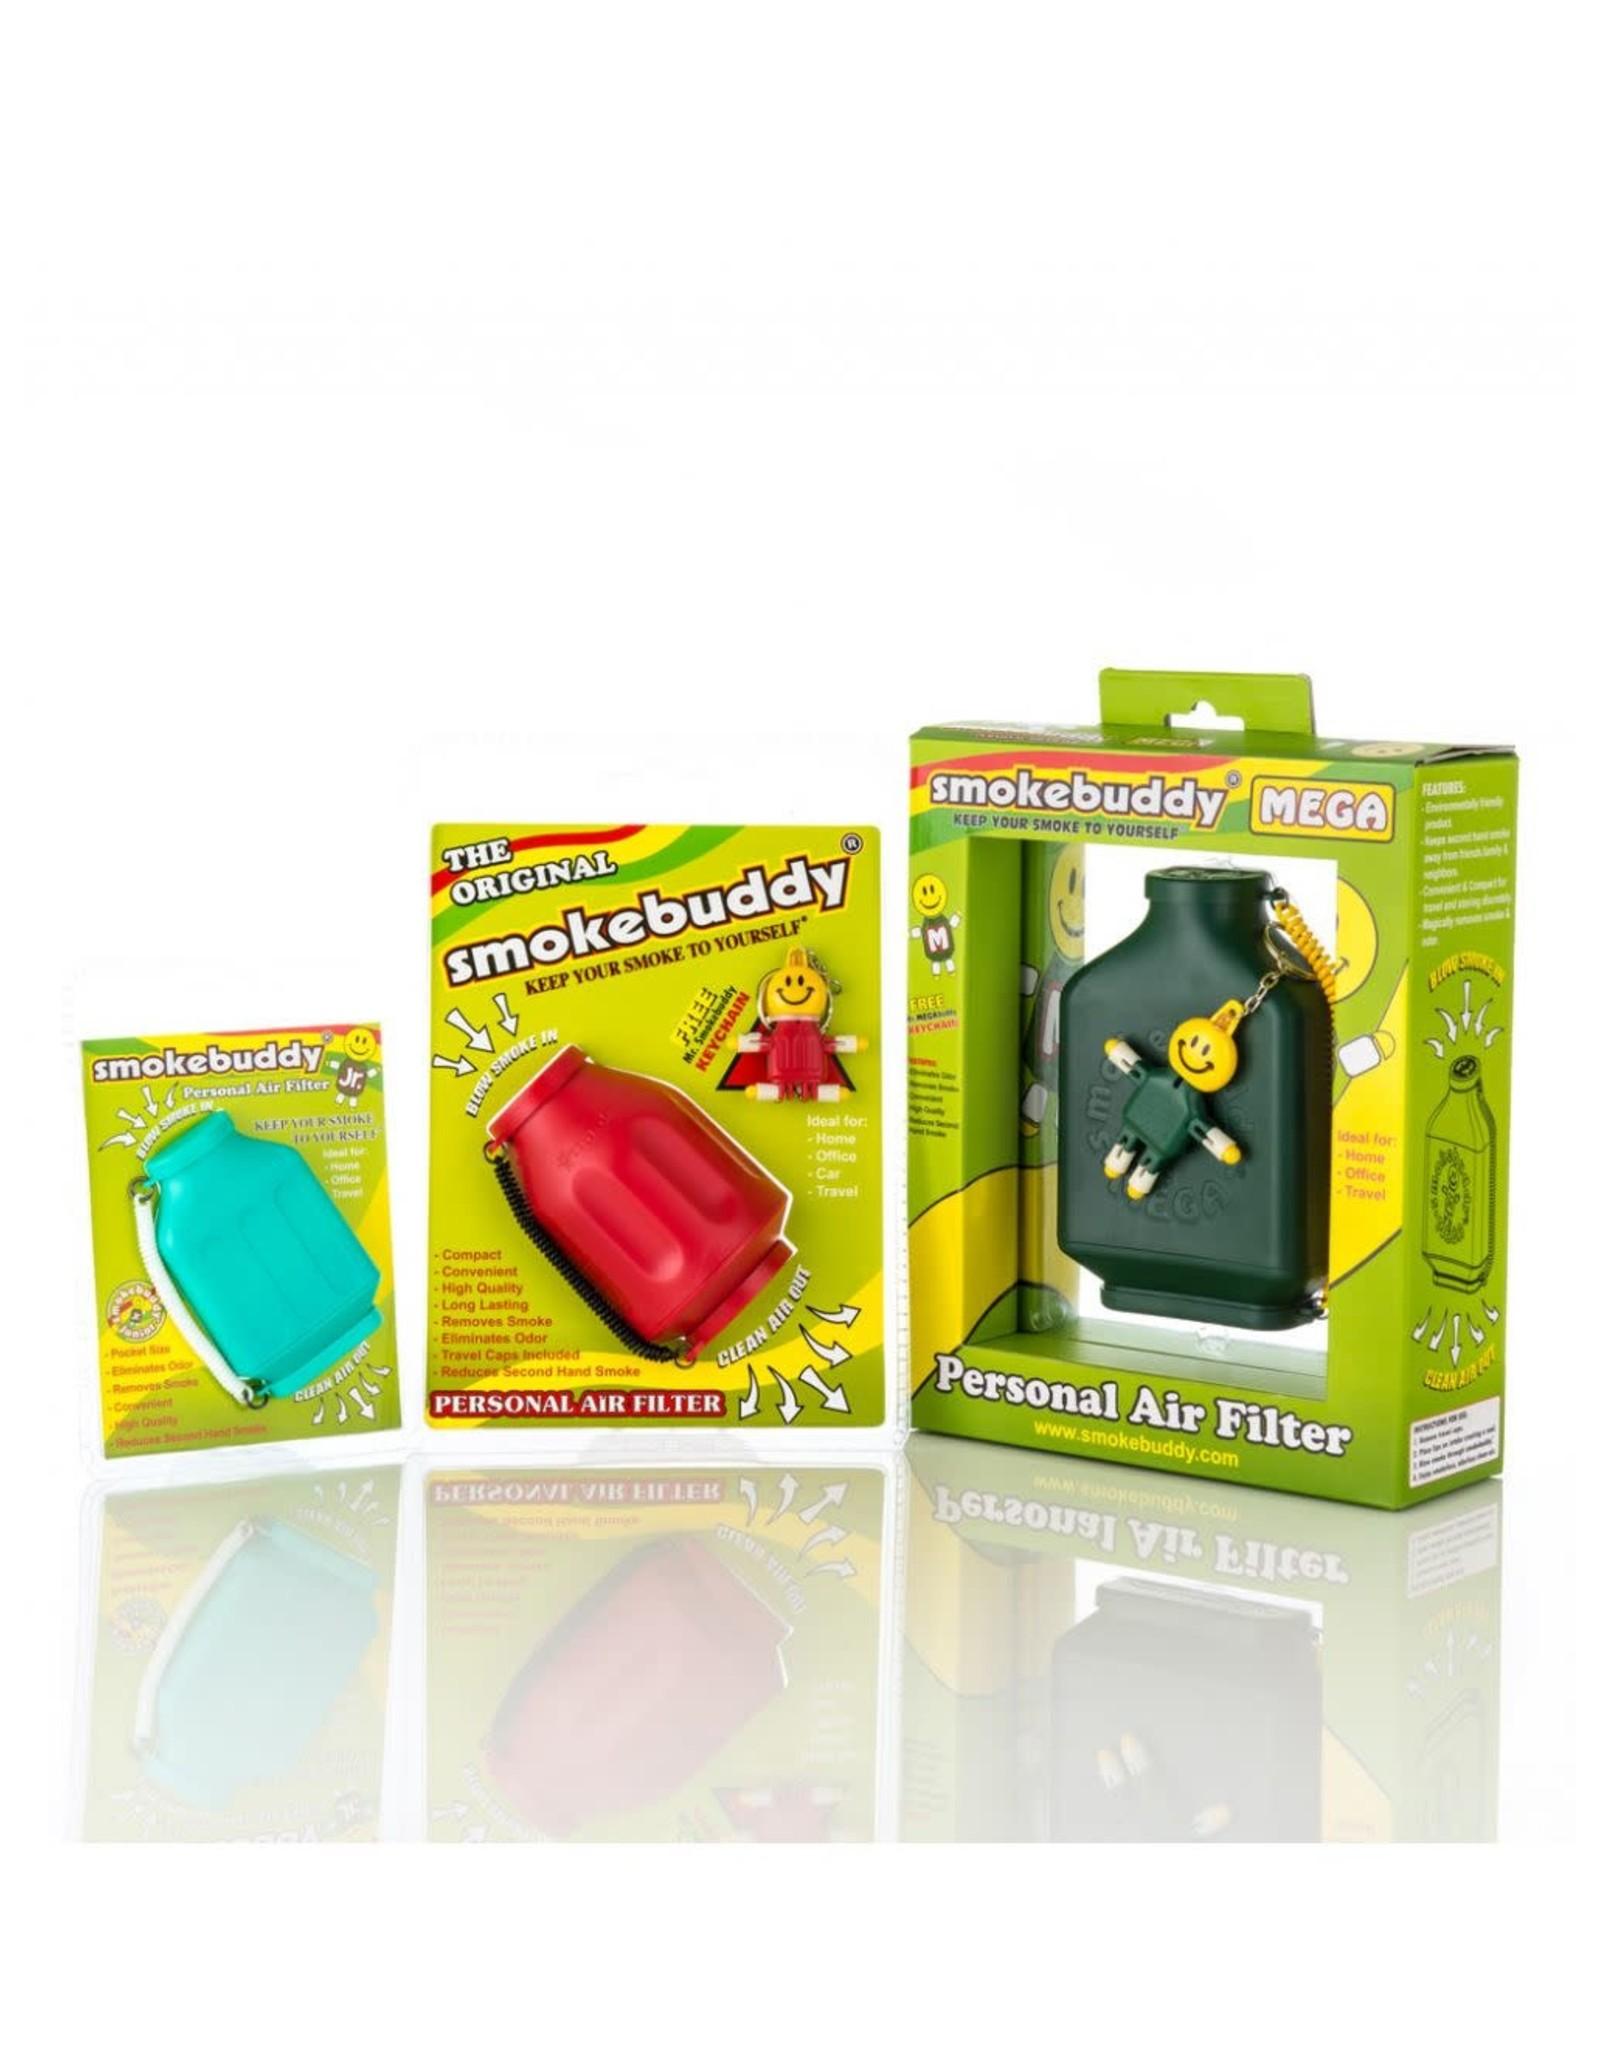 smoke buddy Green Smokebuddy MEGA Personal Air Filter